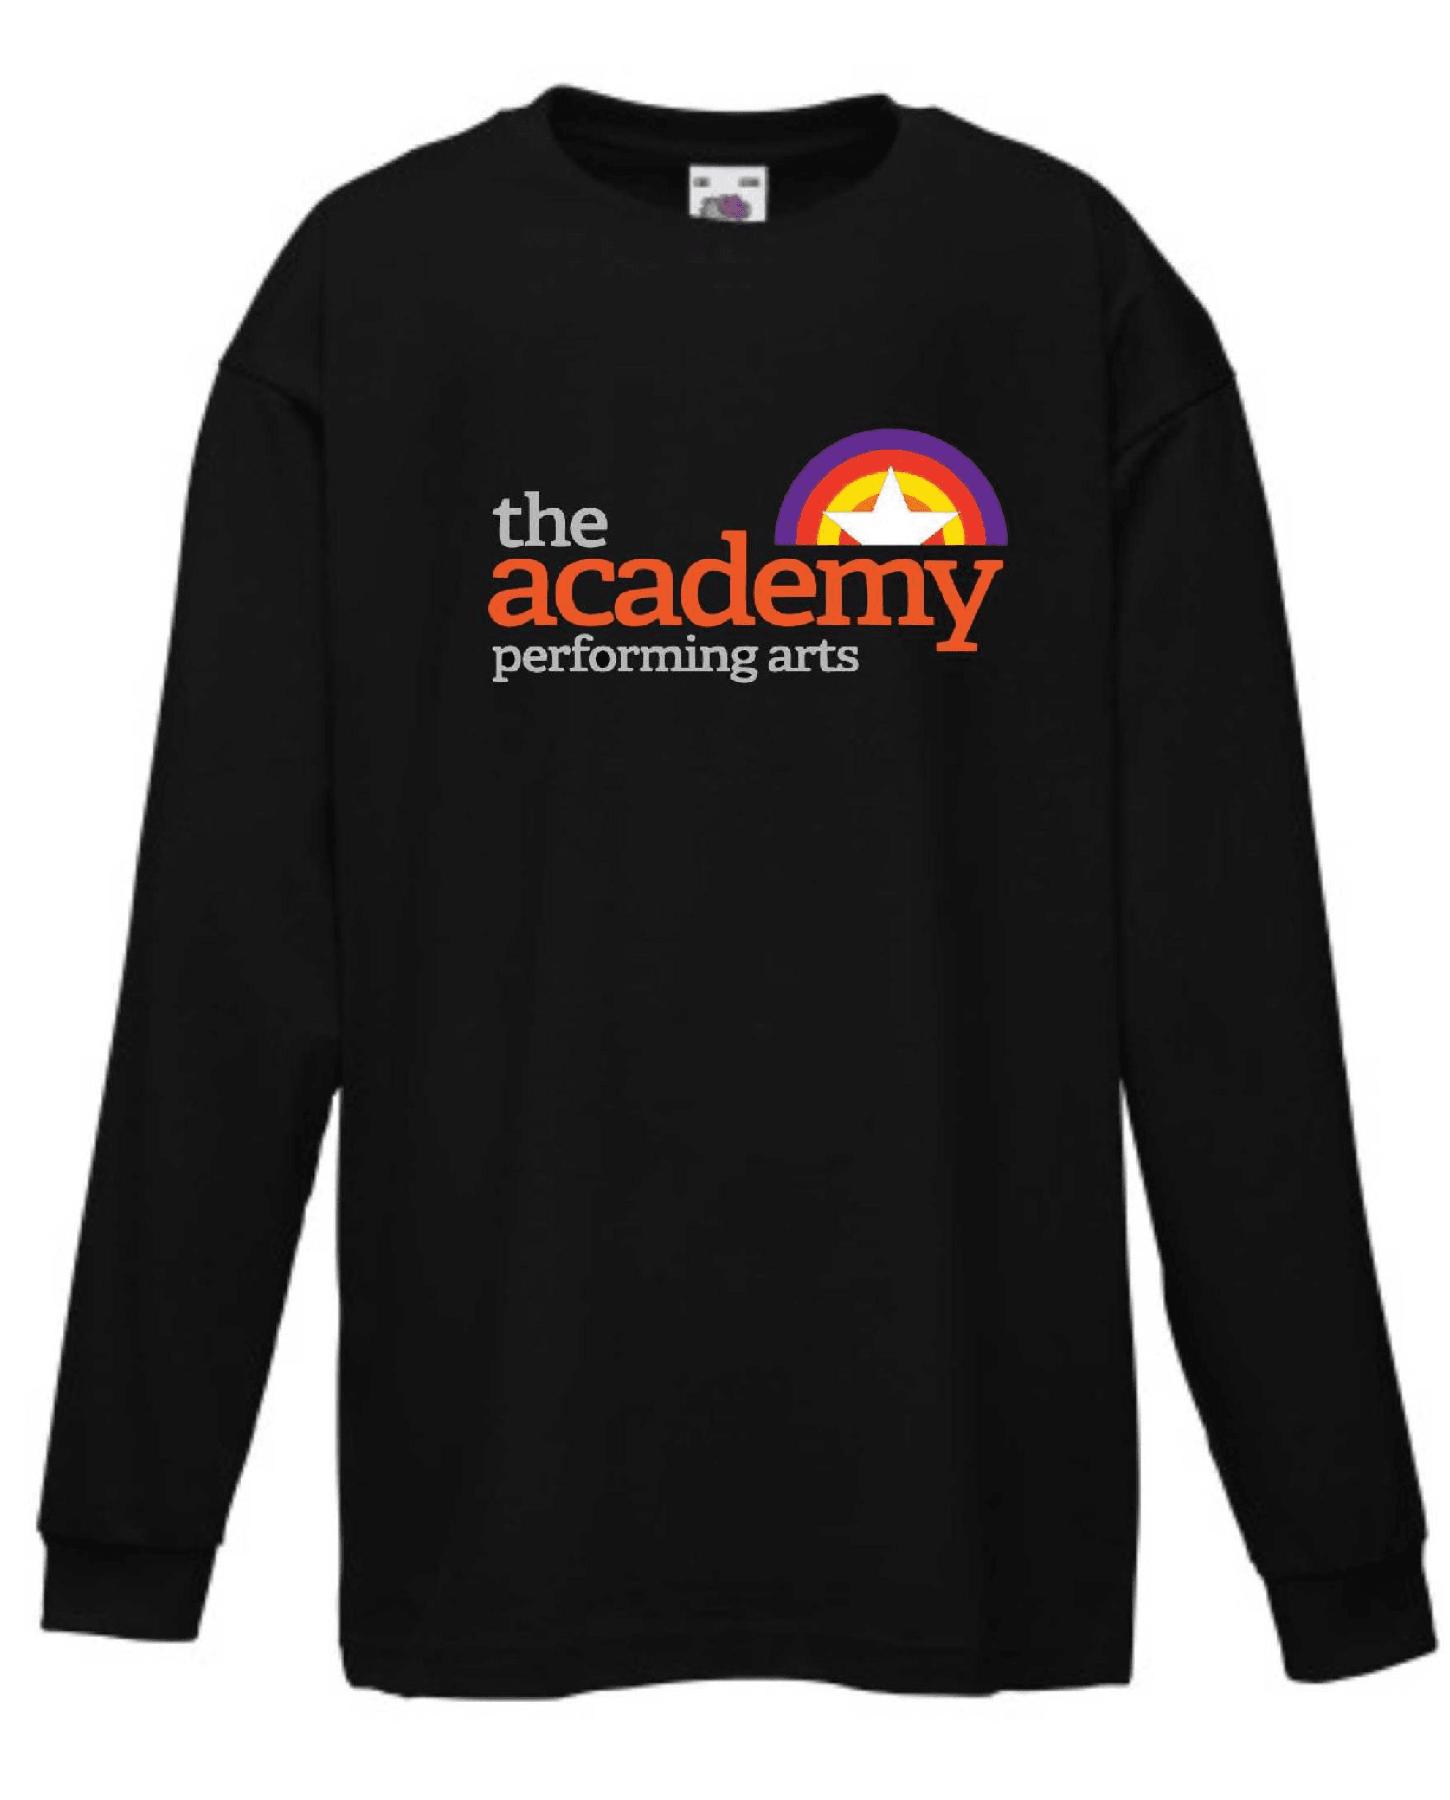 The Academy – Kids Long Sleeve Tee